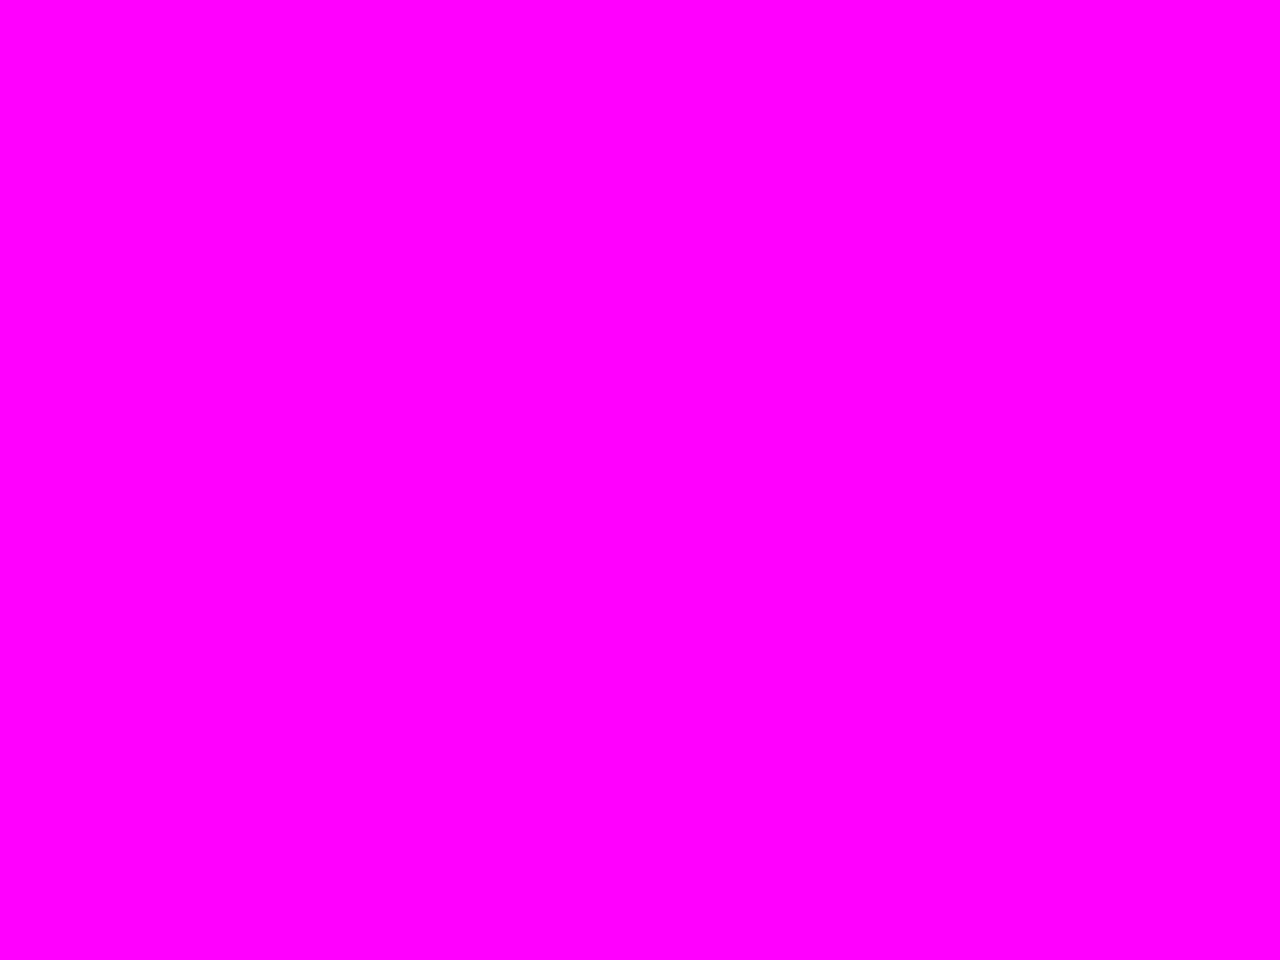 1280x960 Magenta Solid Color Background